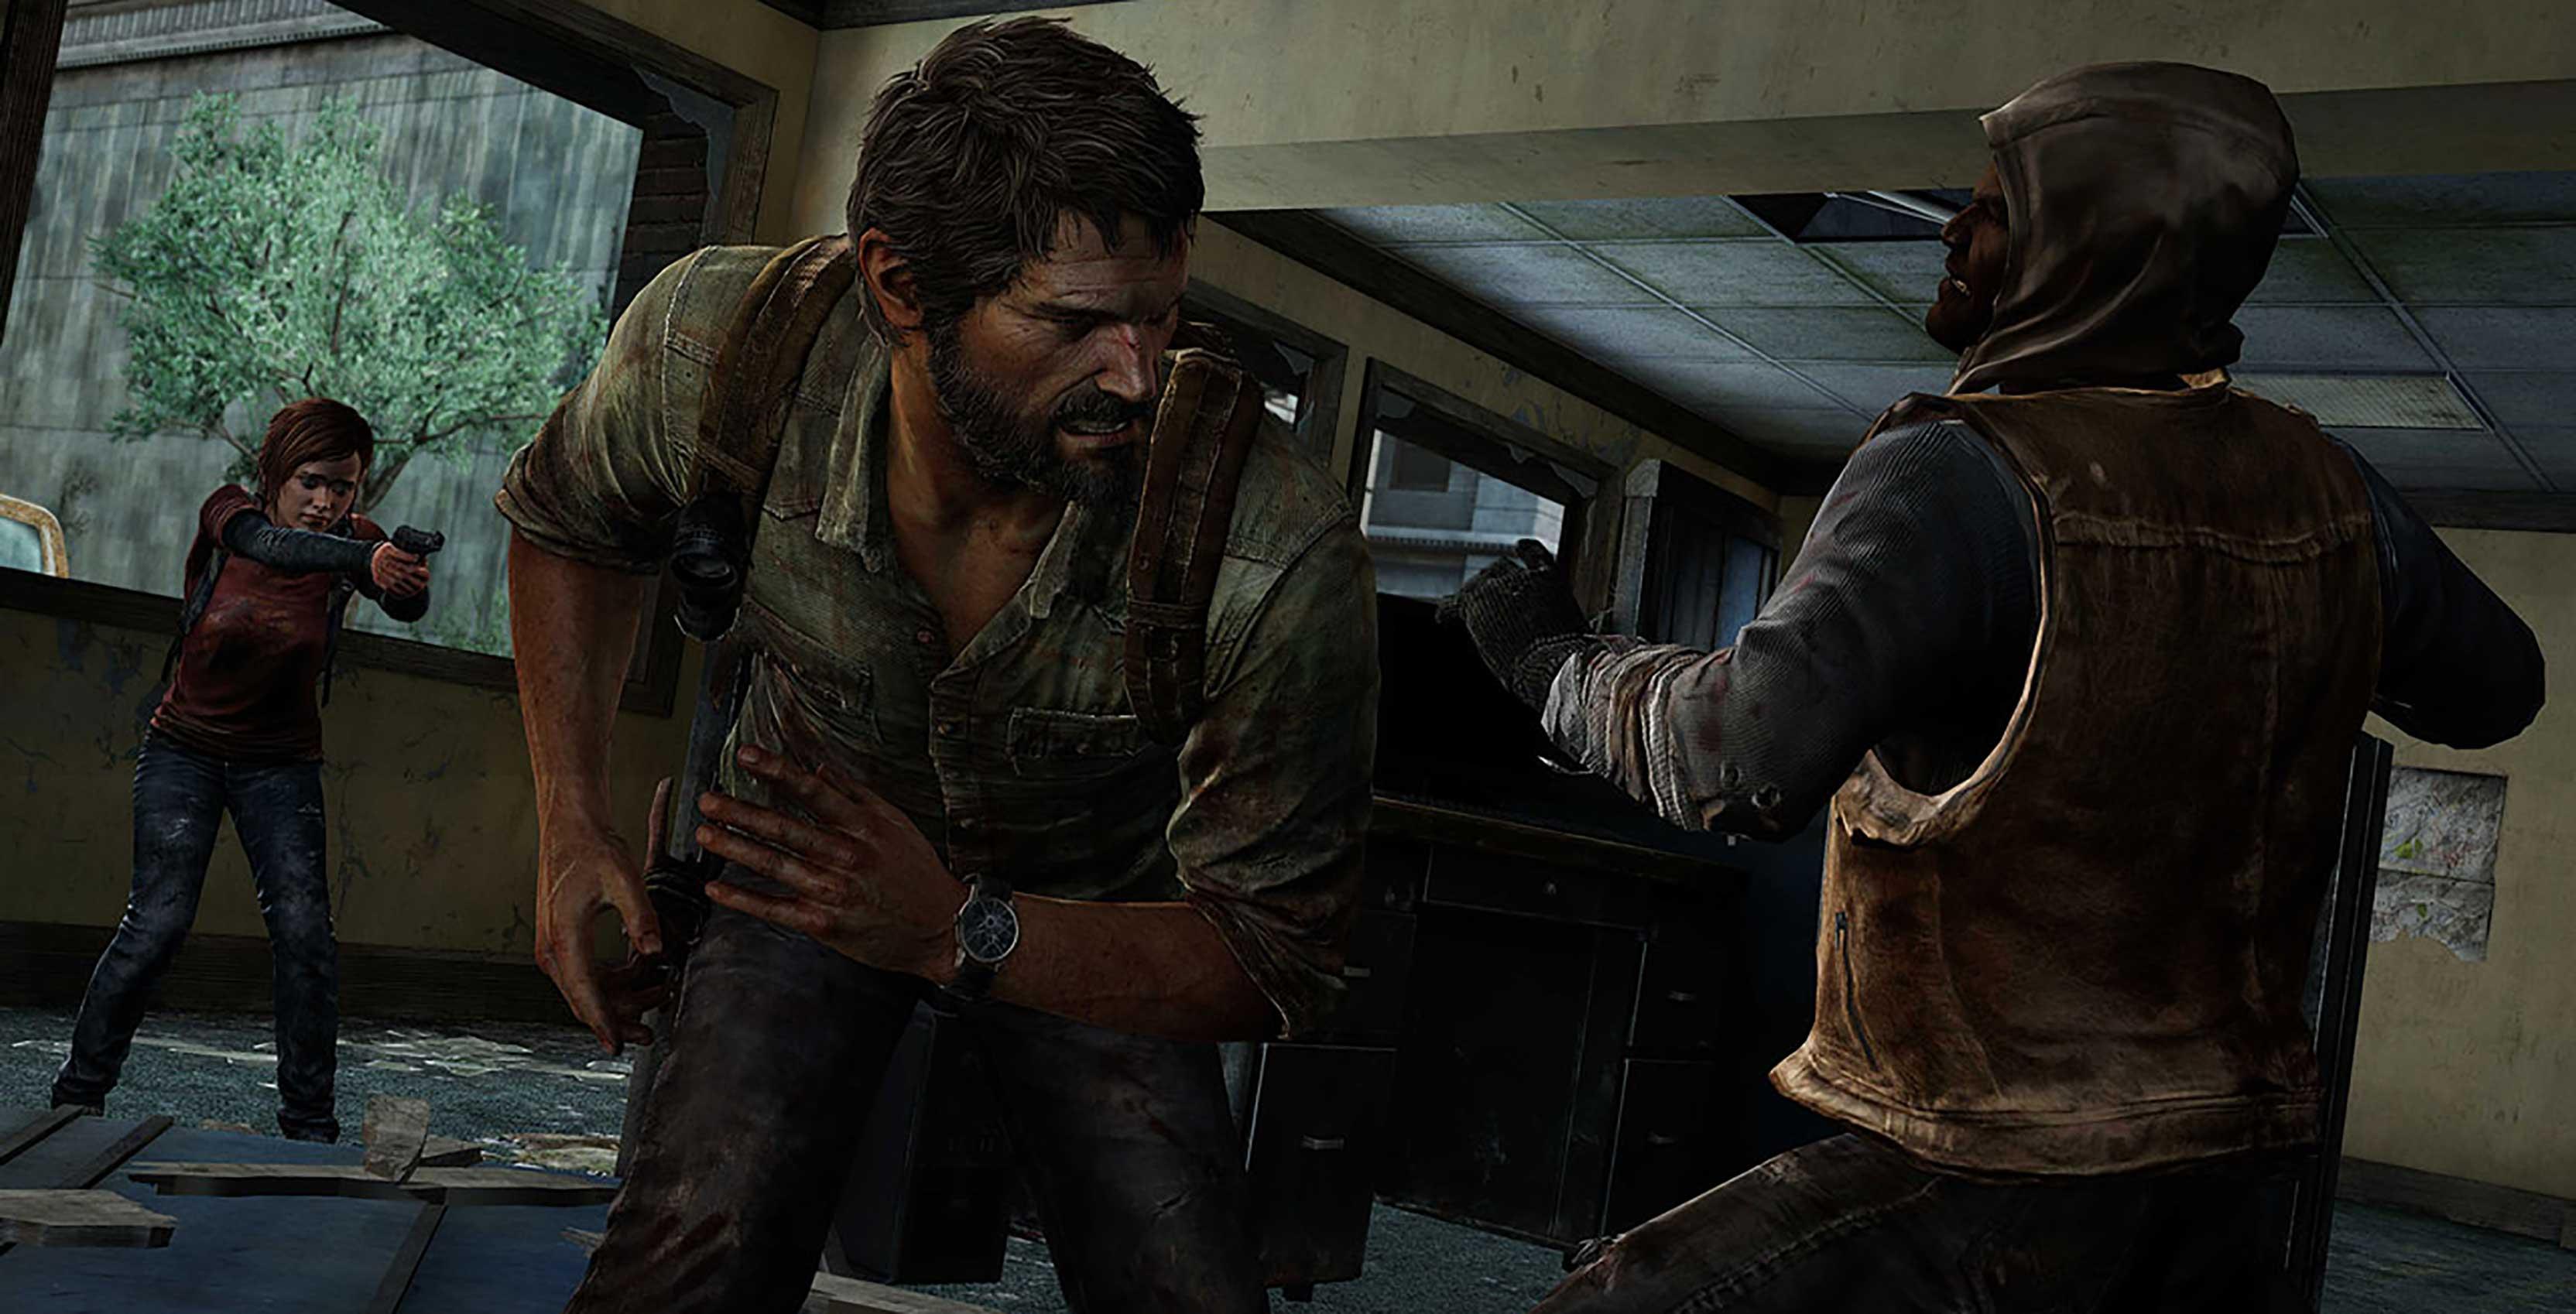 The Last of Us Remastered Joel and Ellie versus human